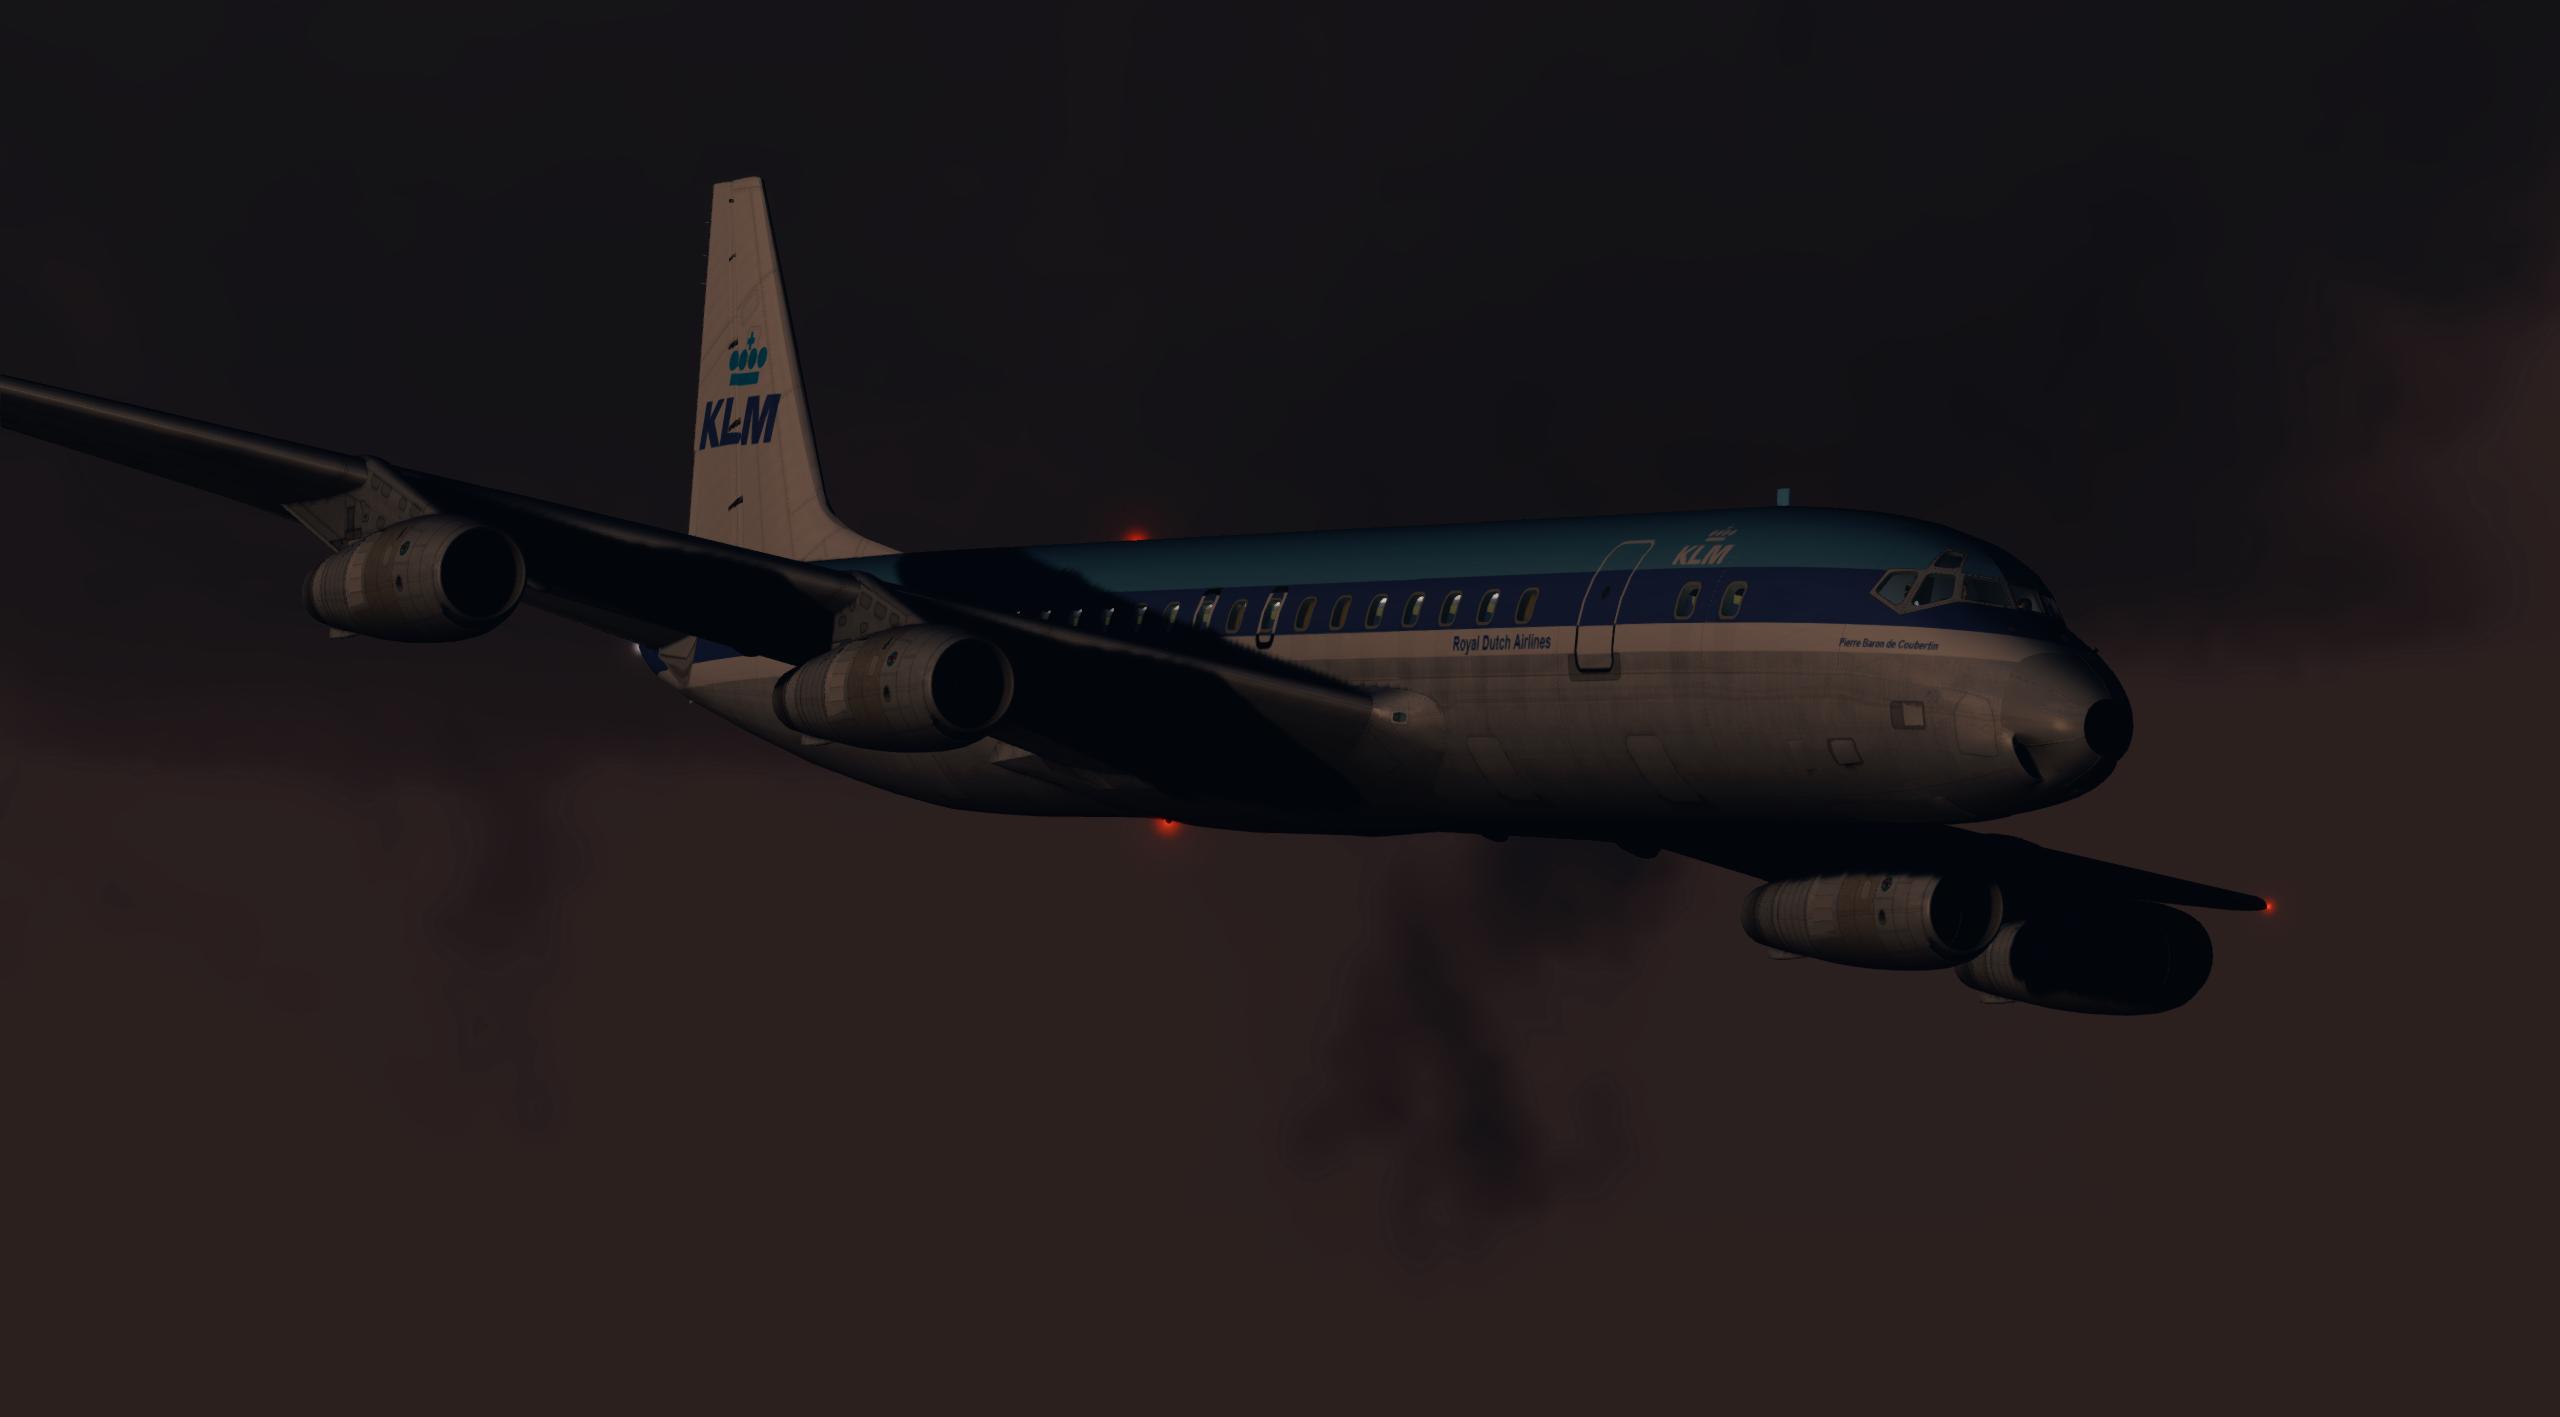 DC8 KLM